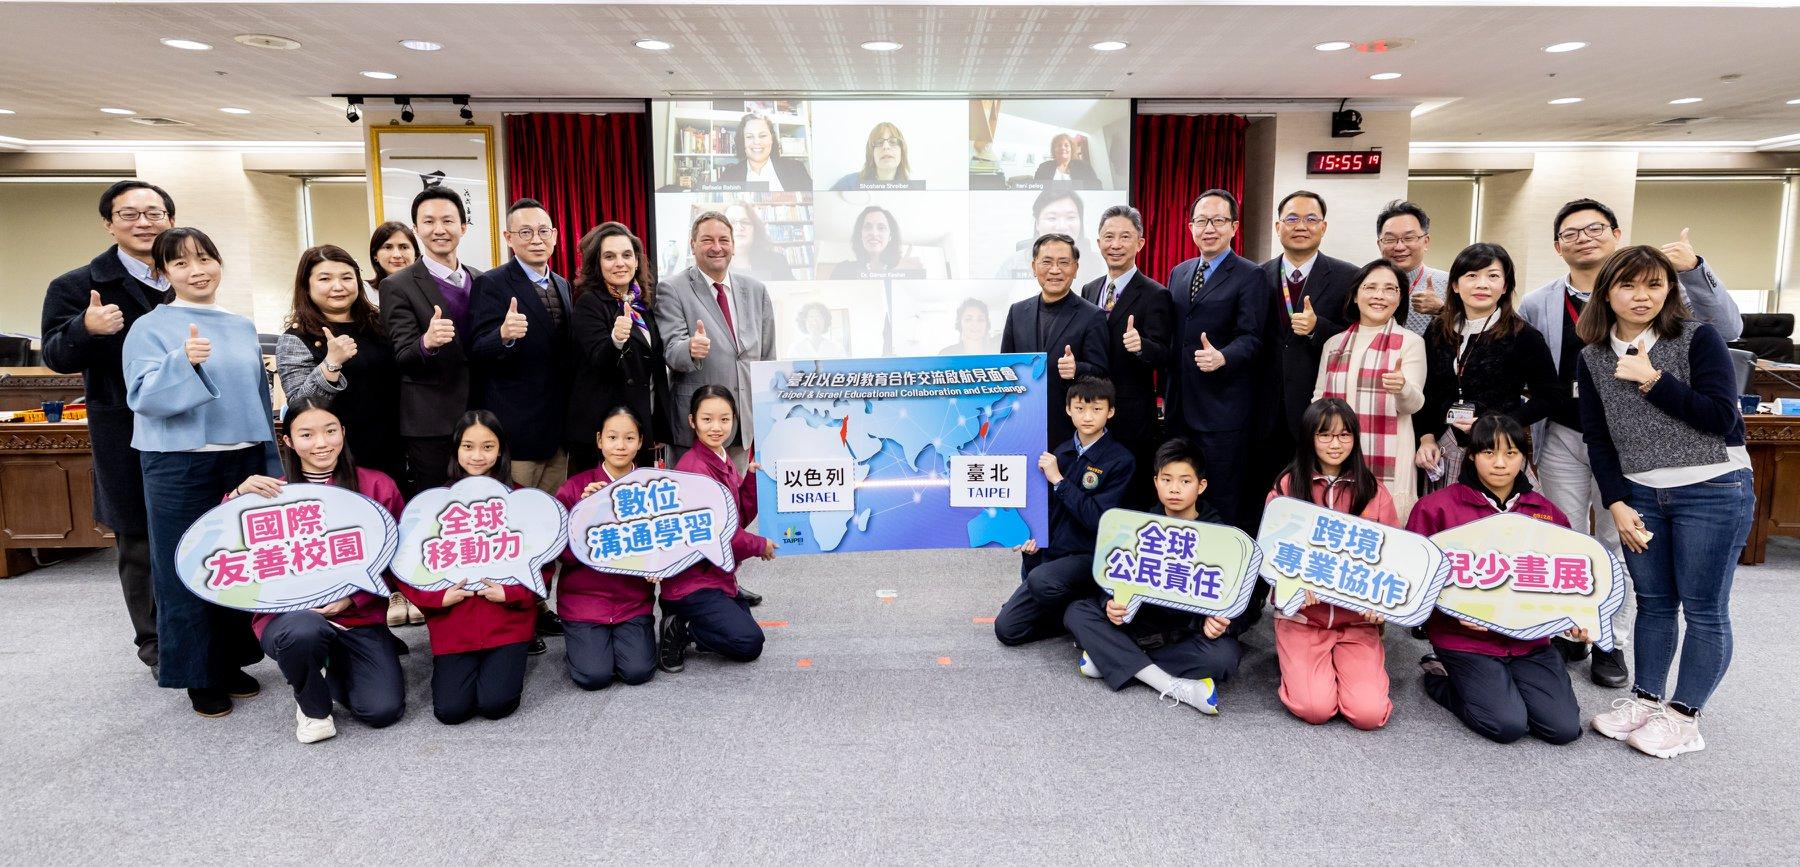 Taipei x Israel Penpal Project for 60 schools